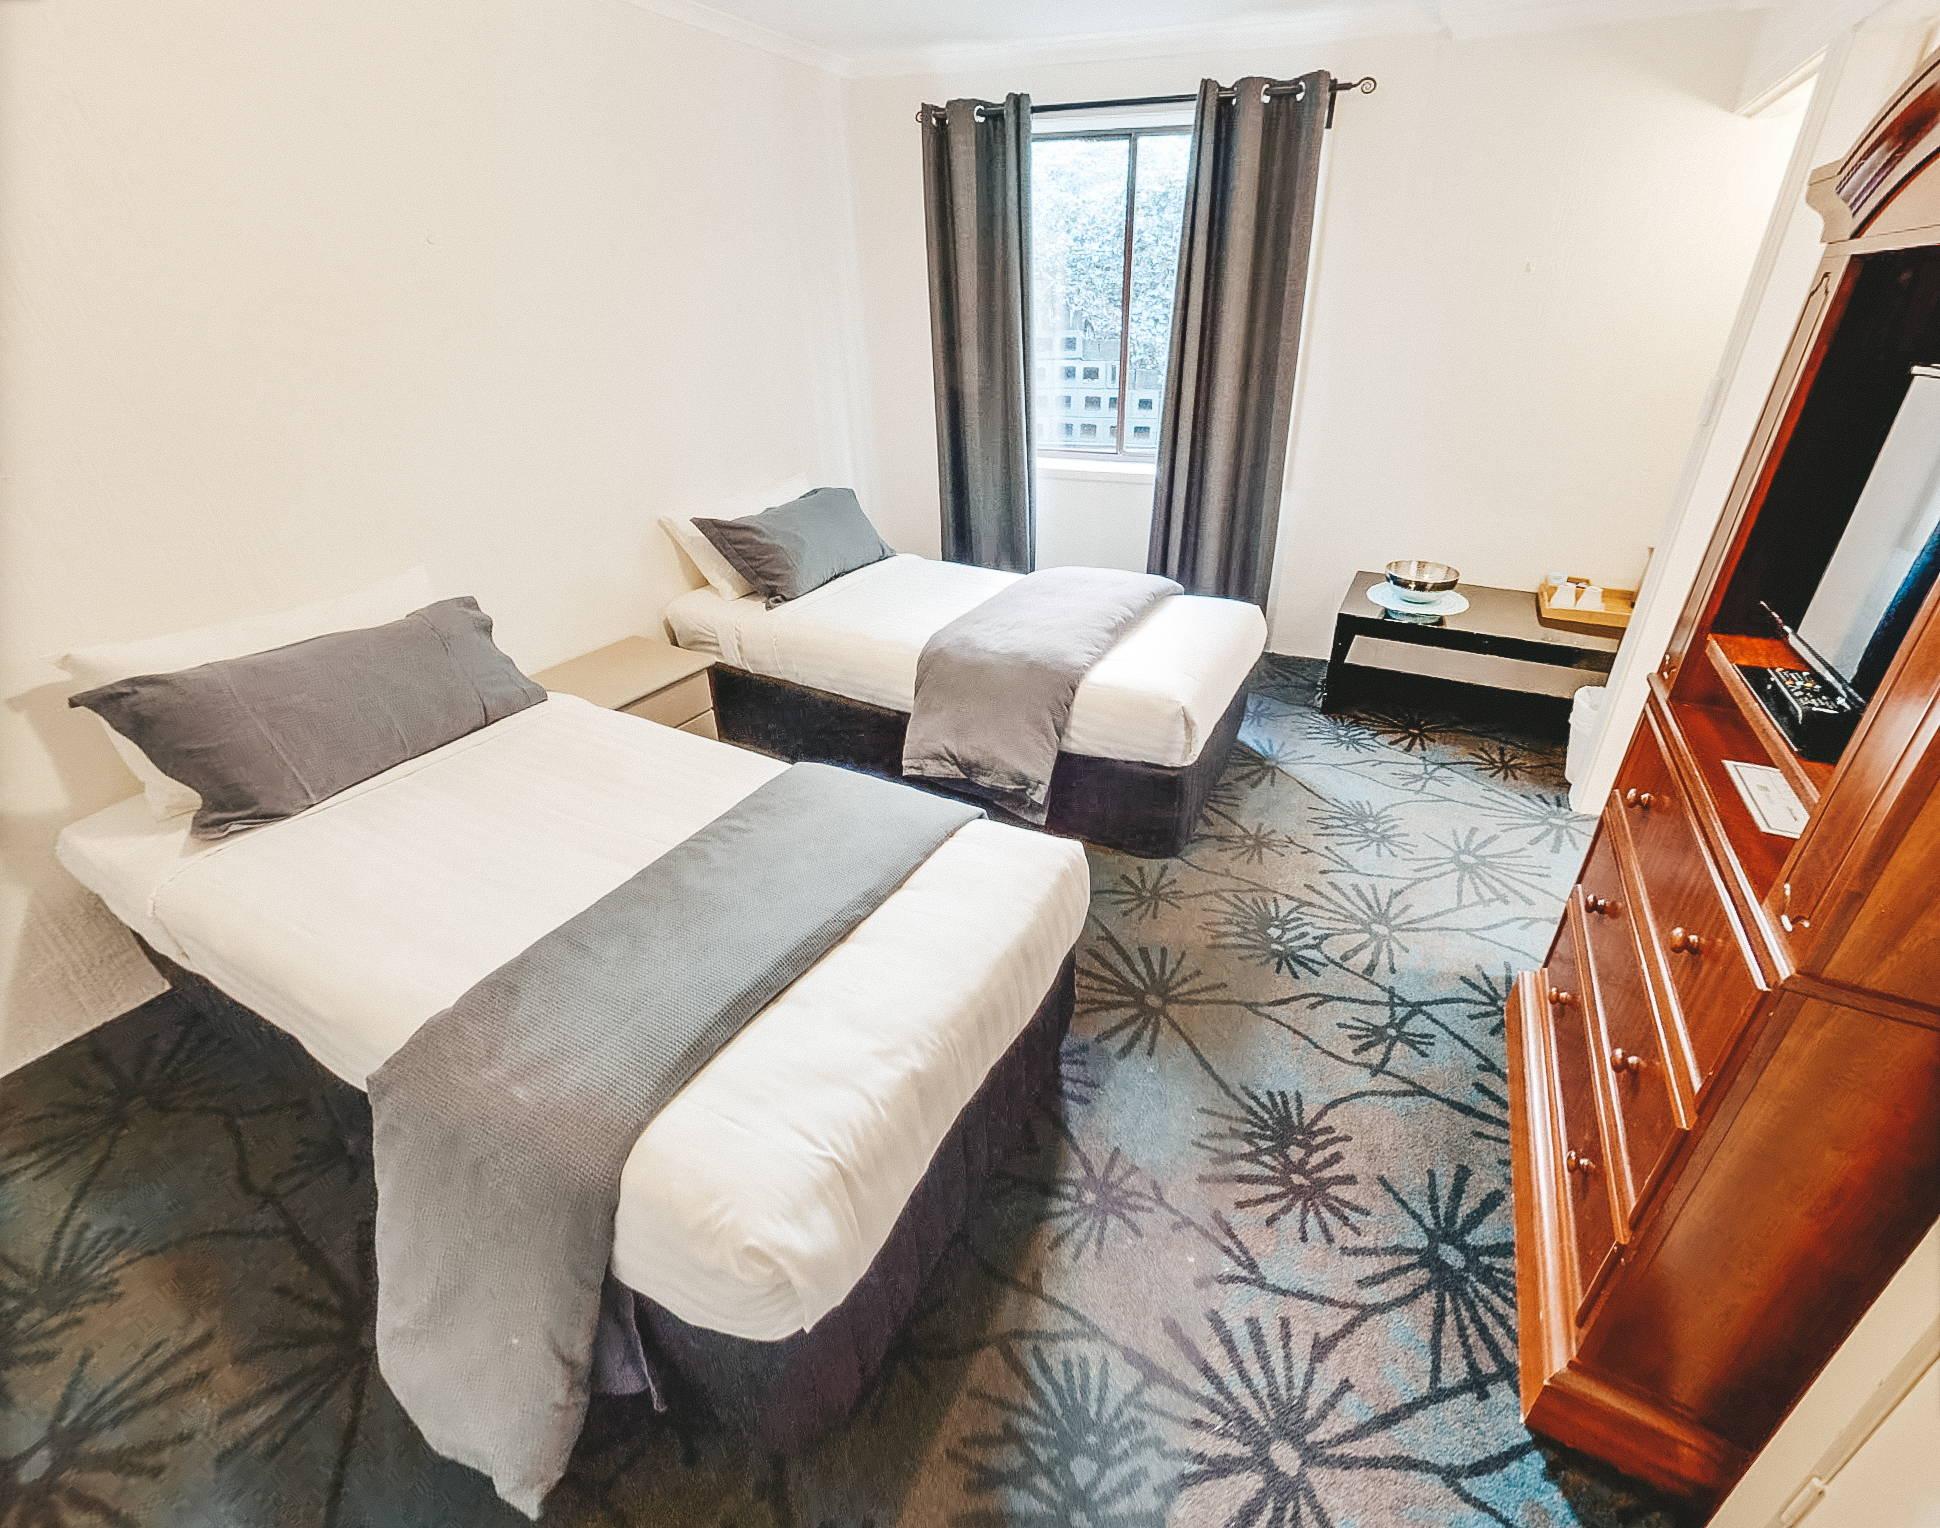 Valley Suite Image - Bernti's Thredbo Accommodation